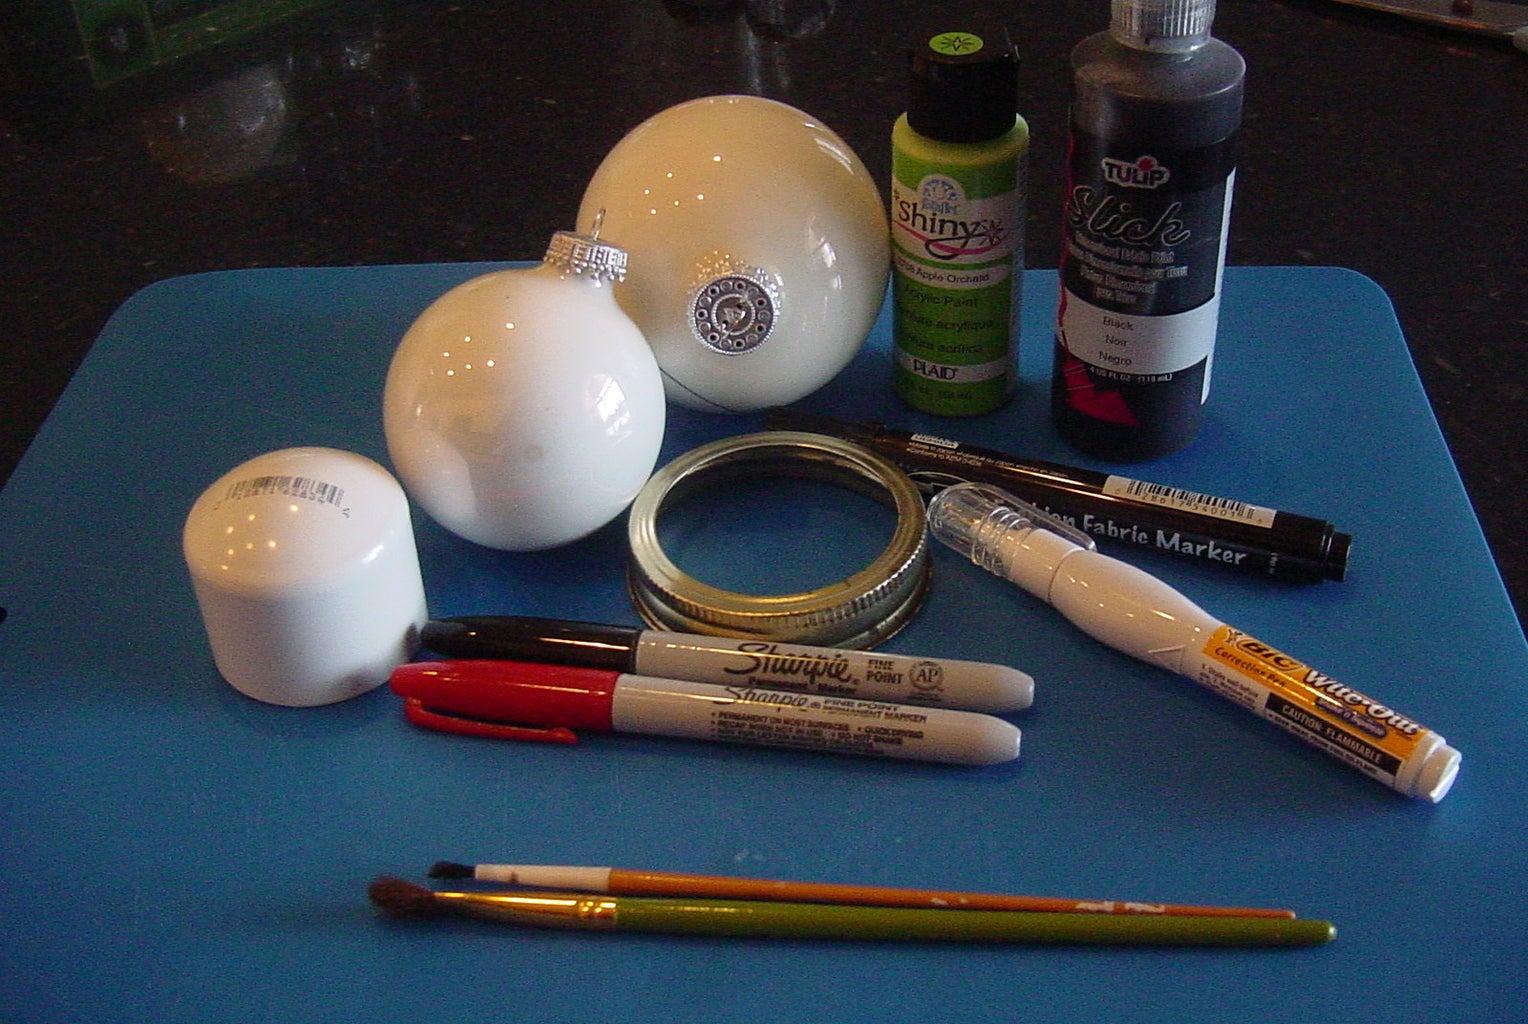 Step 1: Supplies